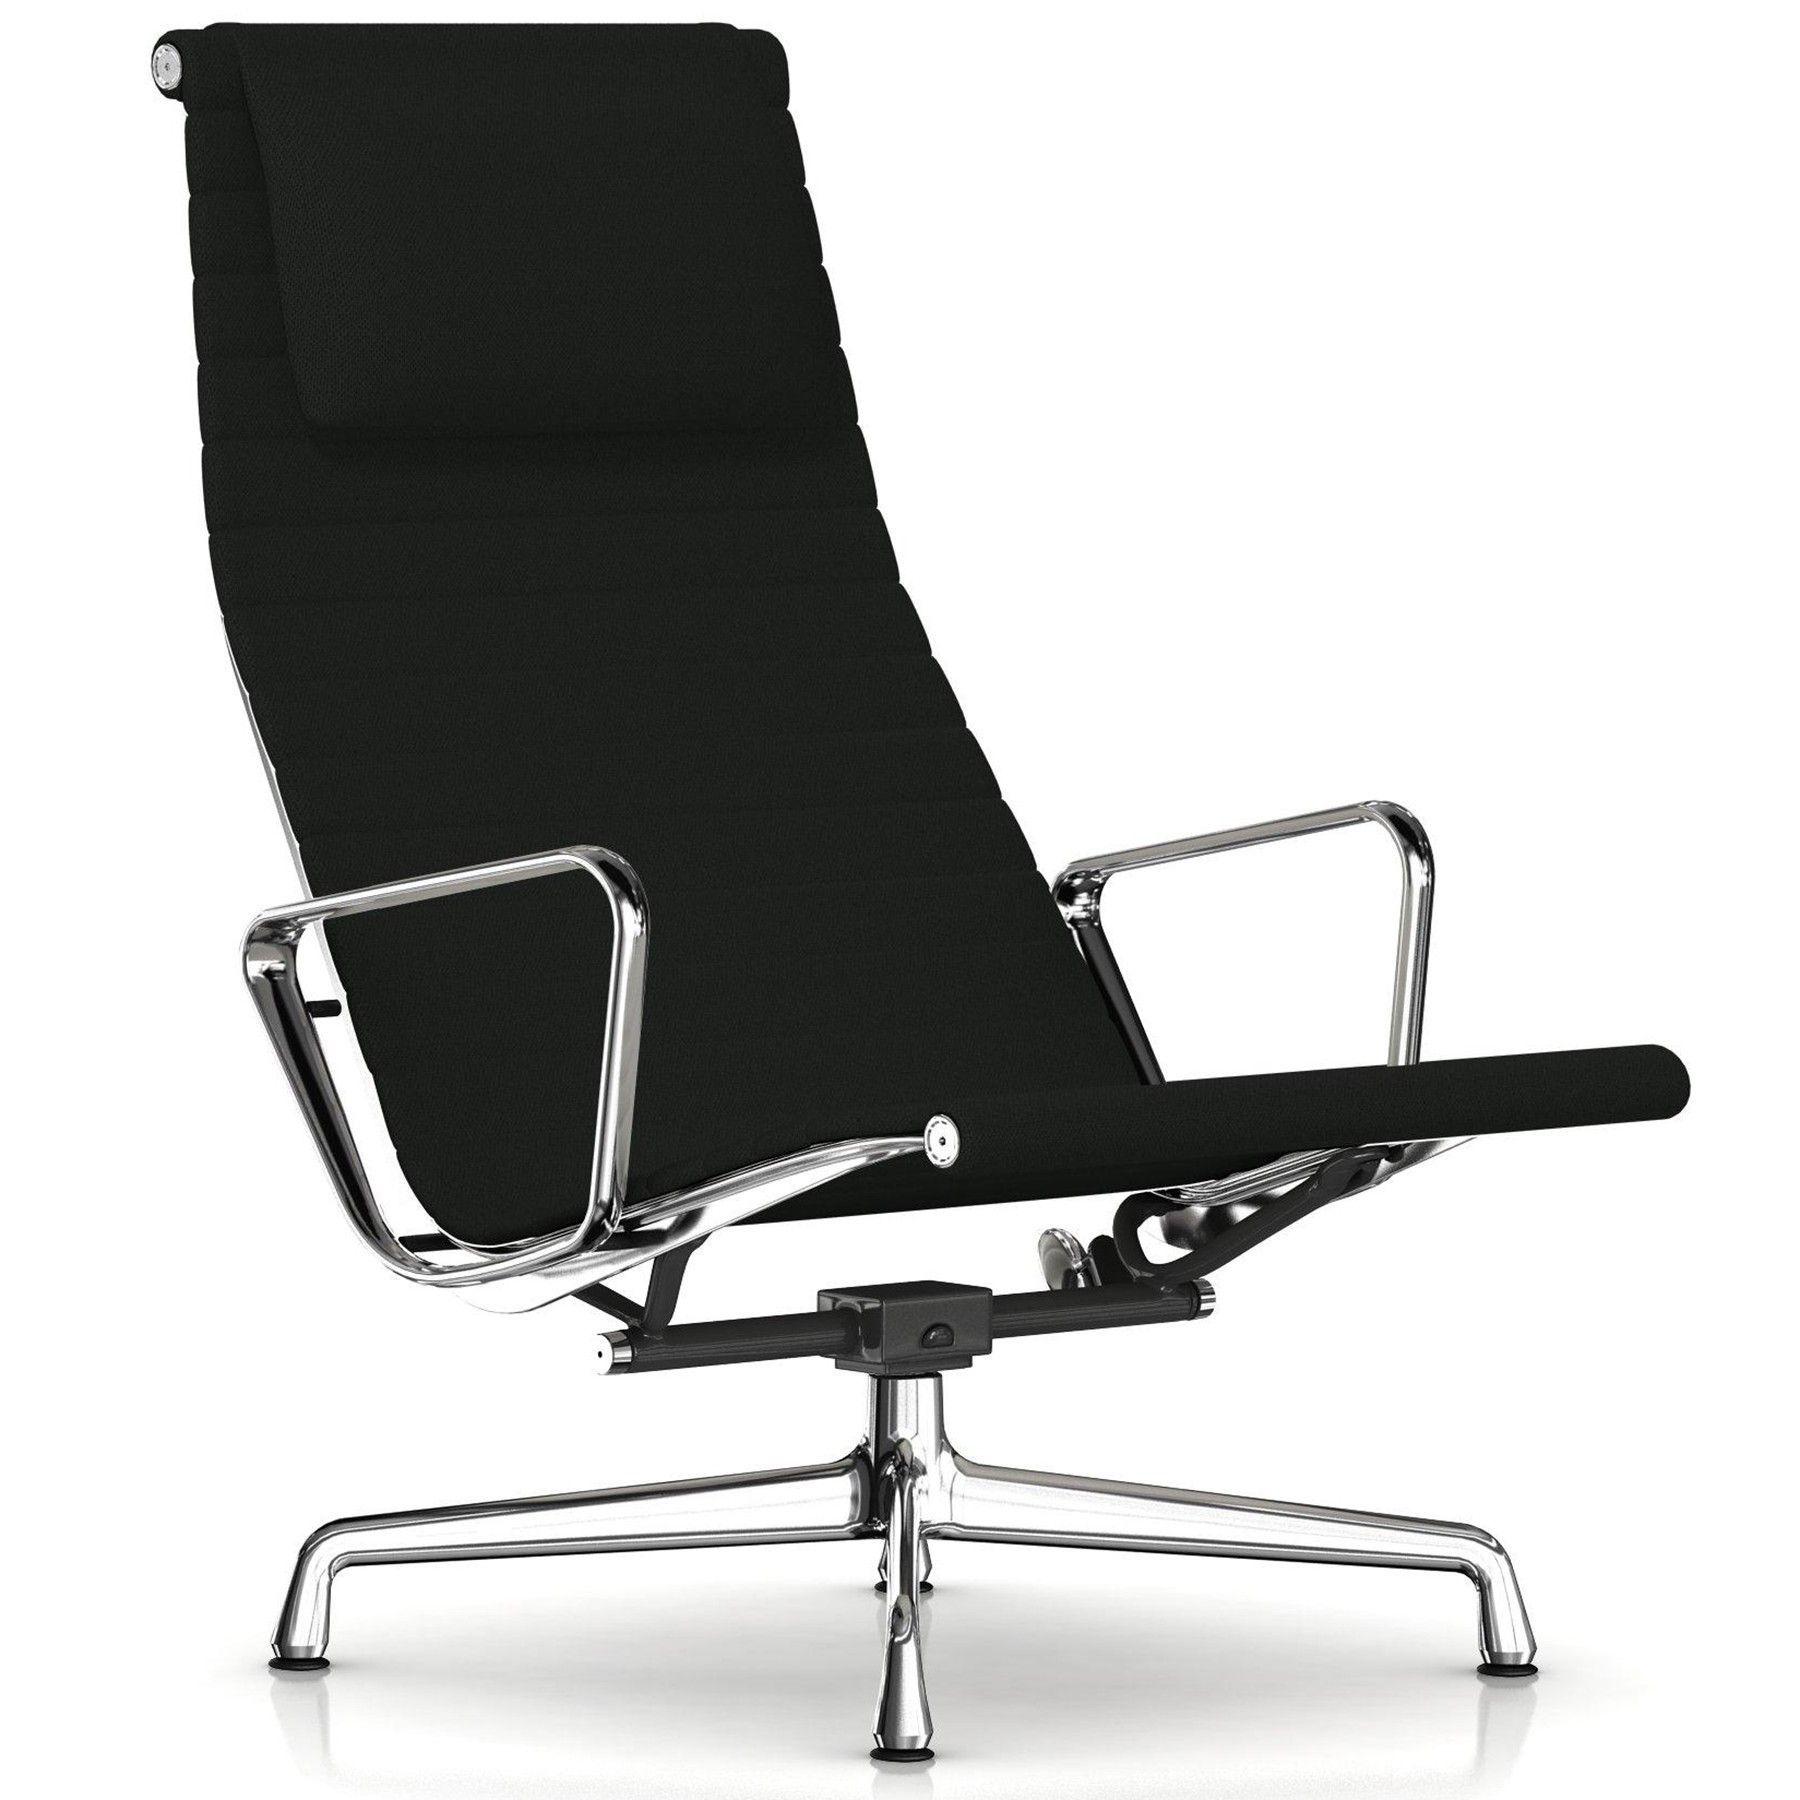 Gentil EA 124 Loungestoel | Vitra